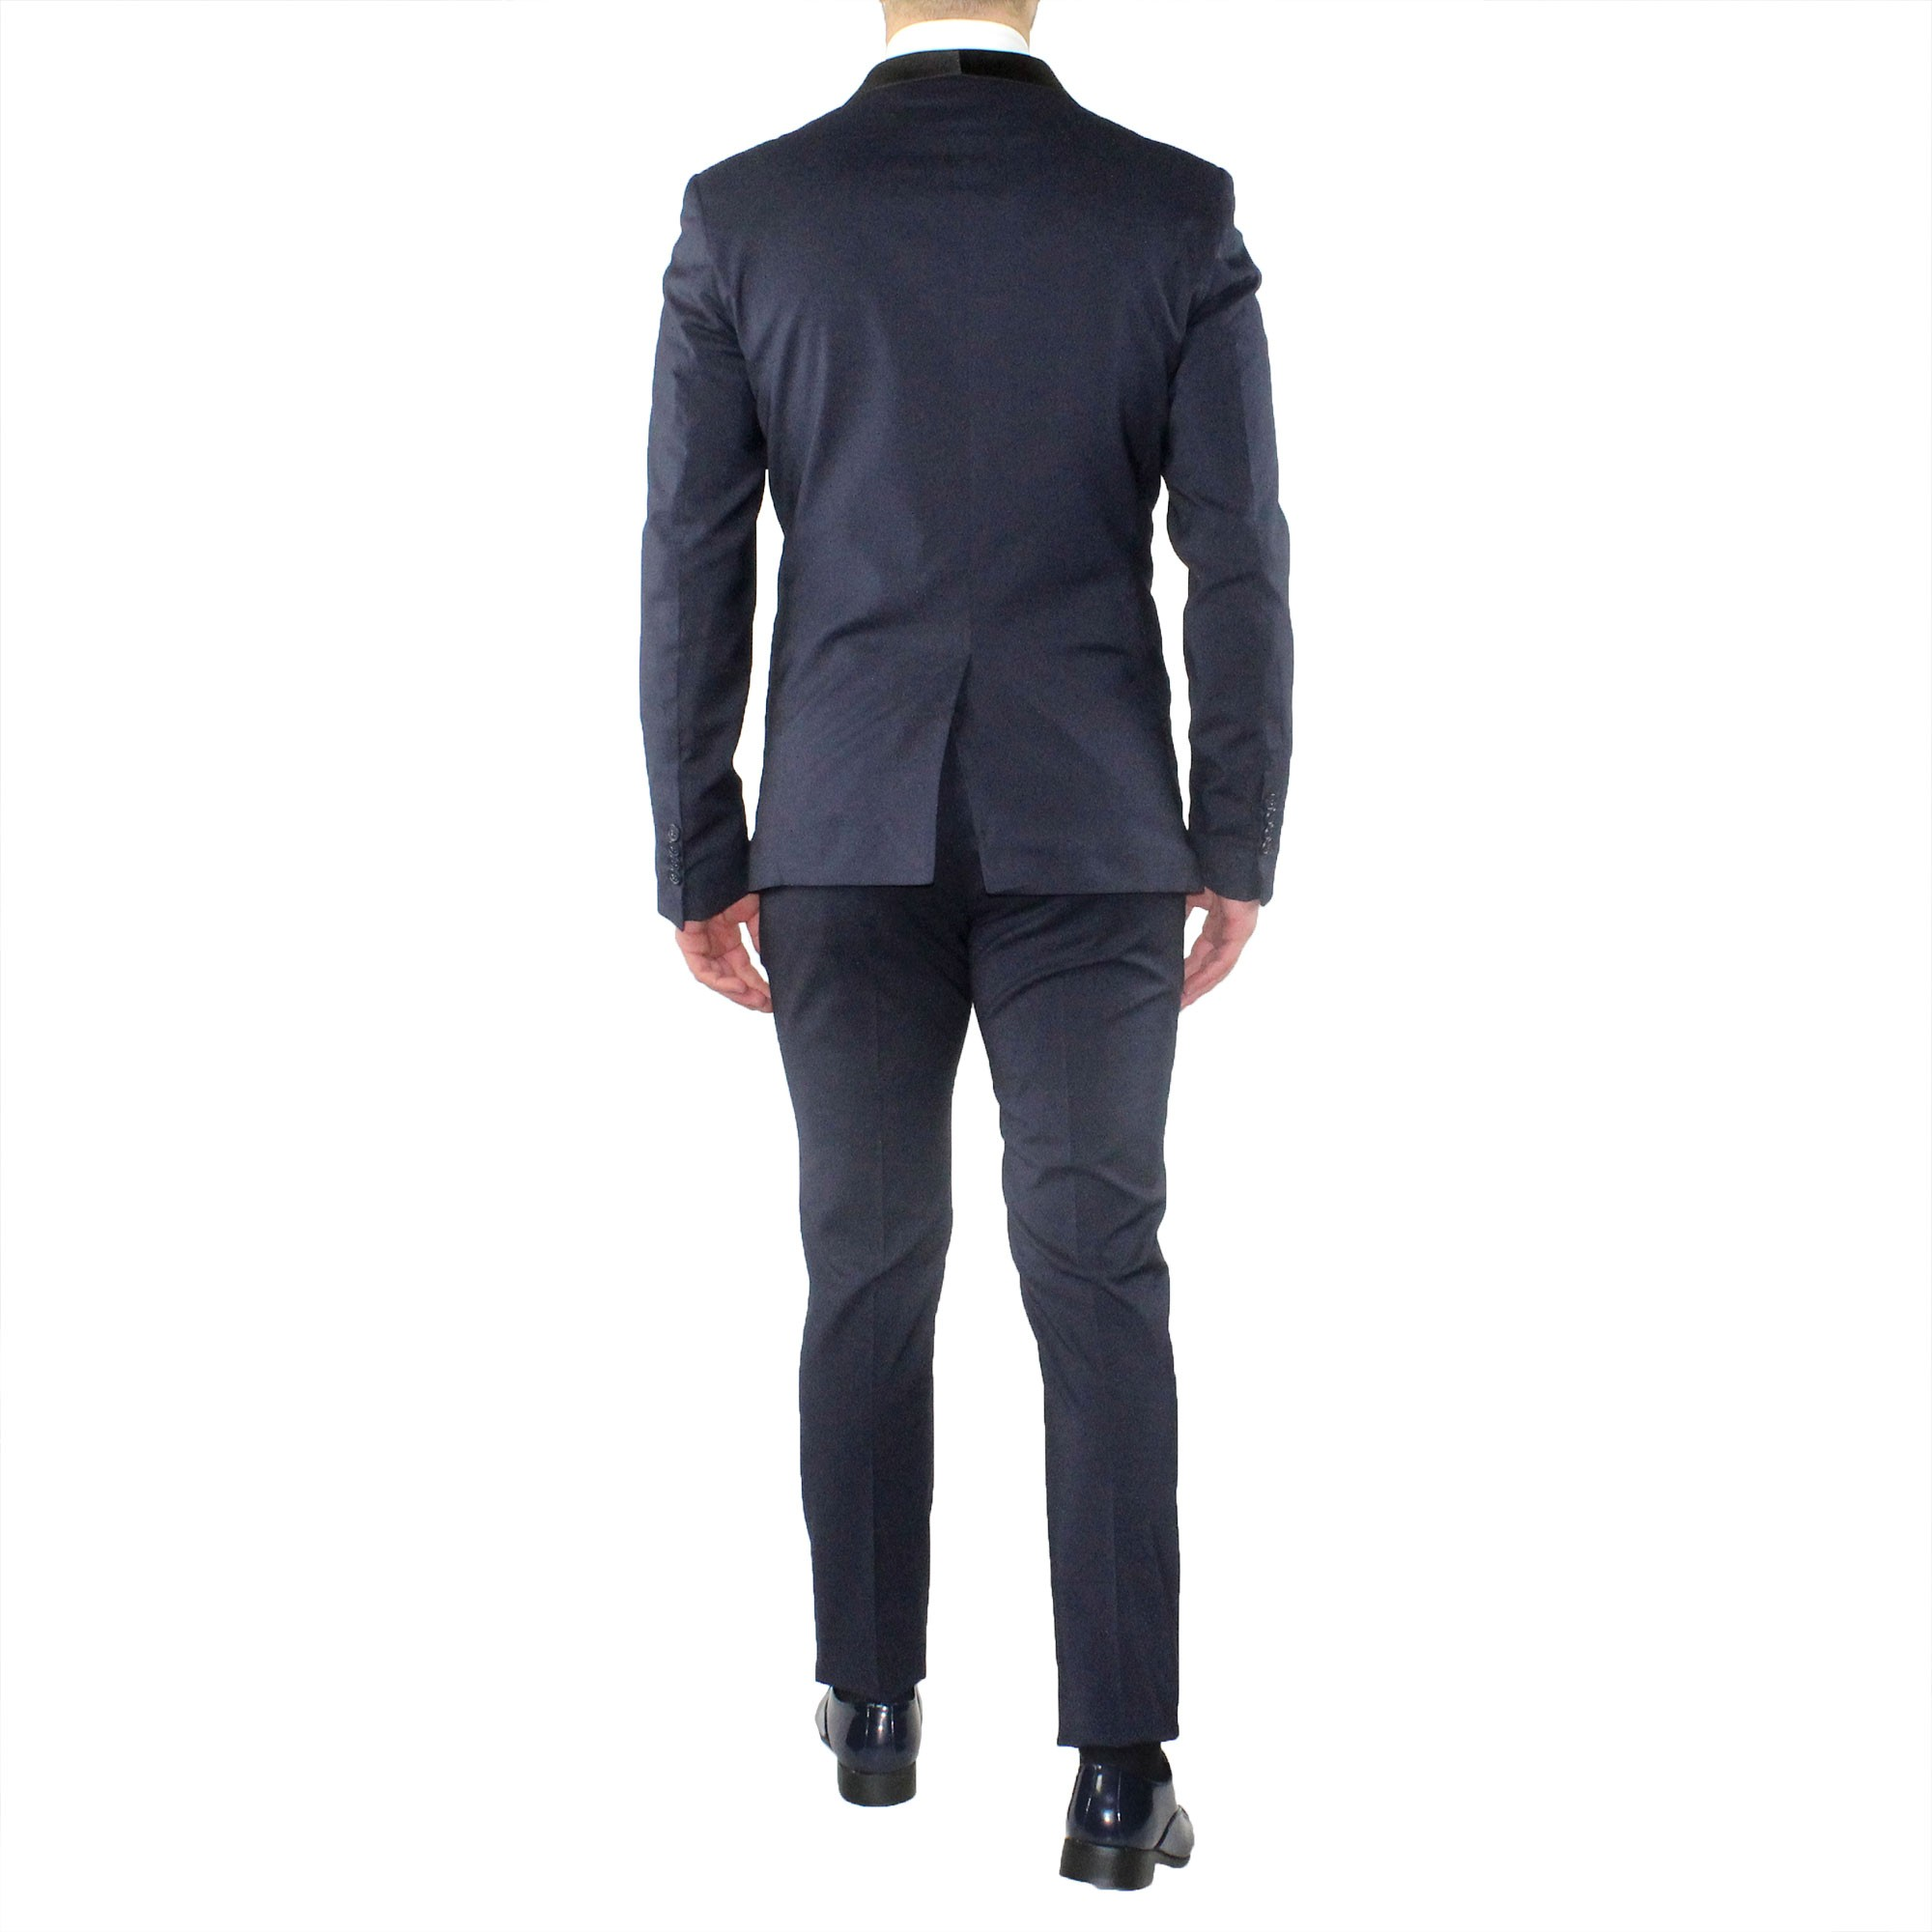 Abito-Uomo-Smoking-Elegante-Vestito-Completo-Estivo-Cerimonia-Sartoriale-Slim miniatura 7